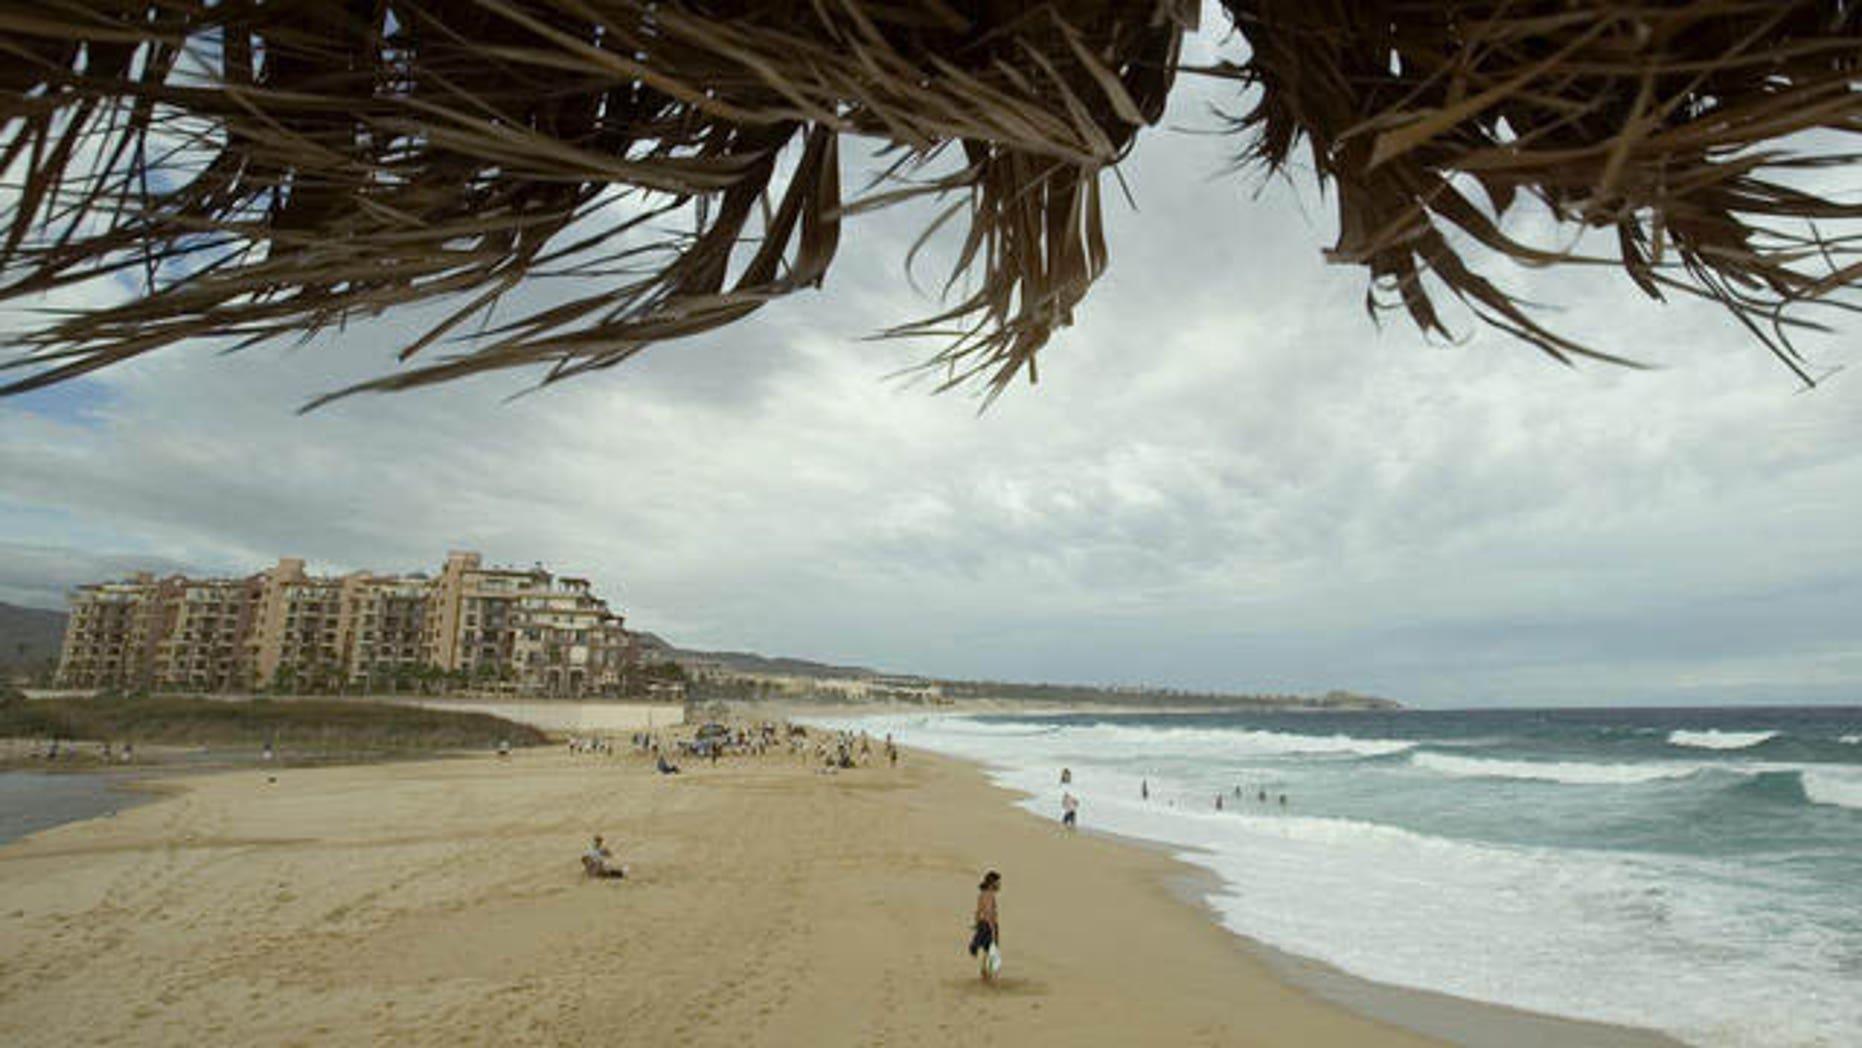 A view of the beach at Cabo San Lucas, Mexico (AP Photo)